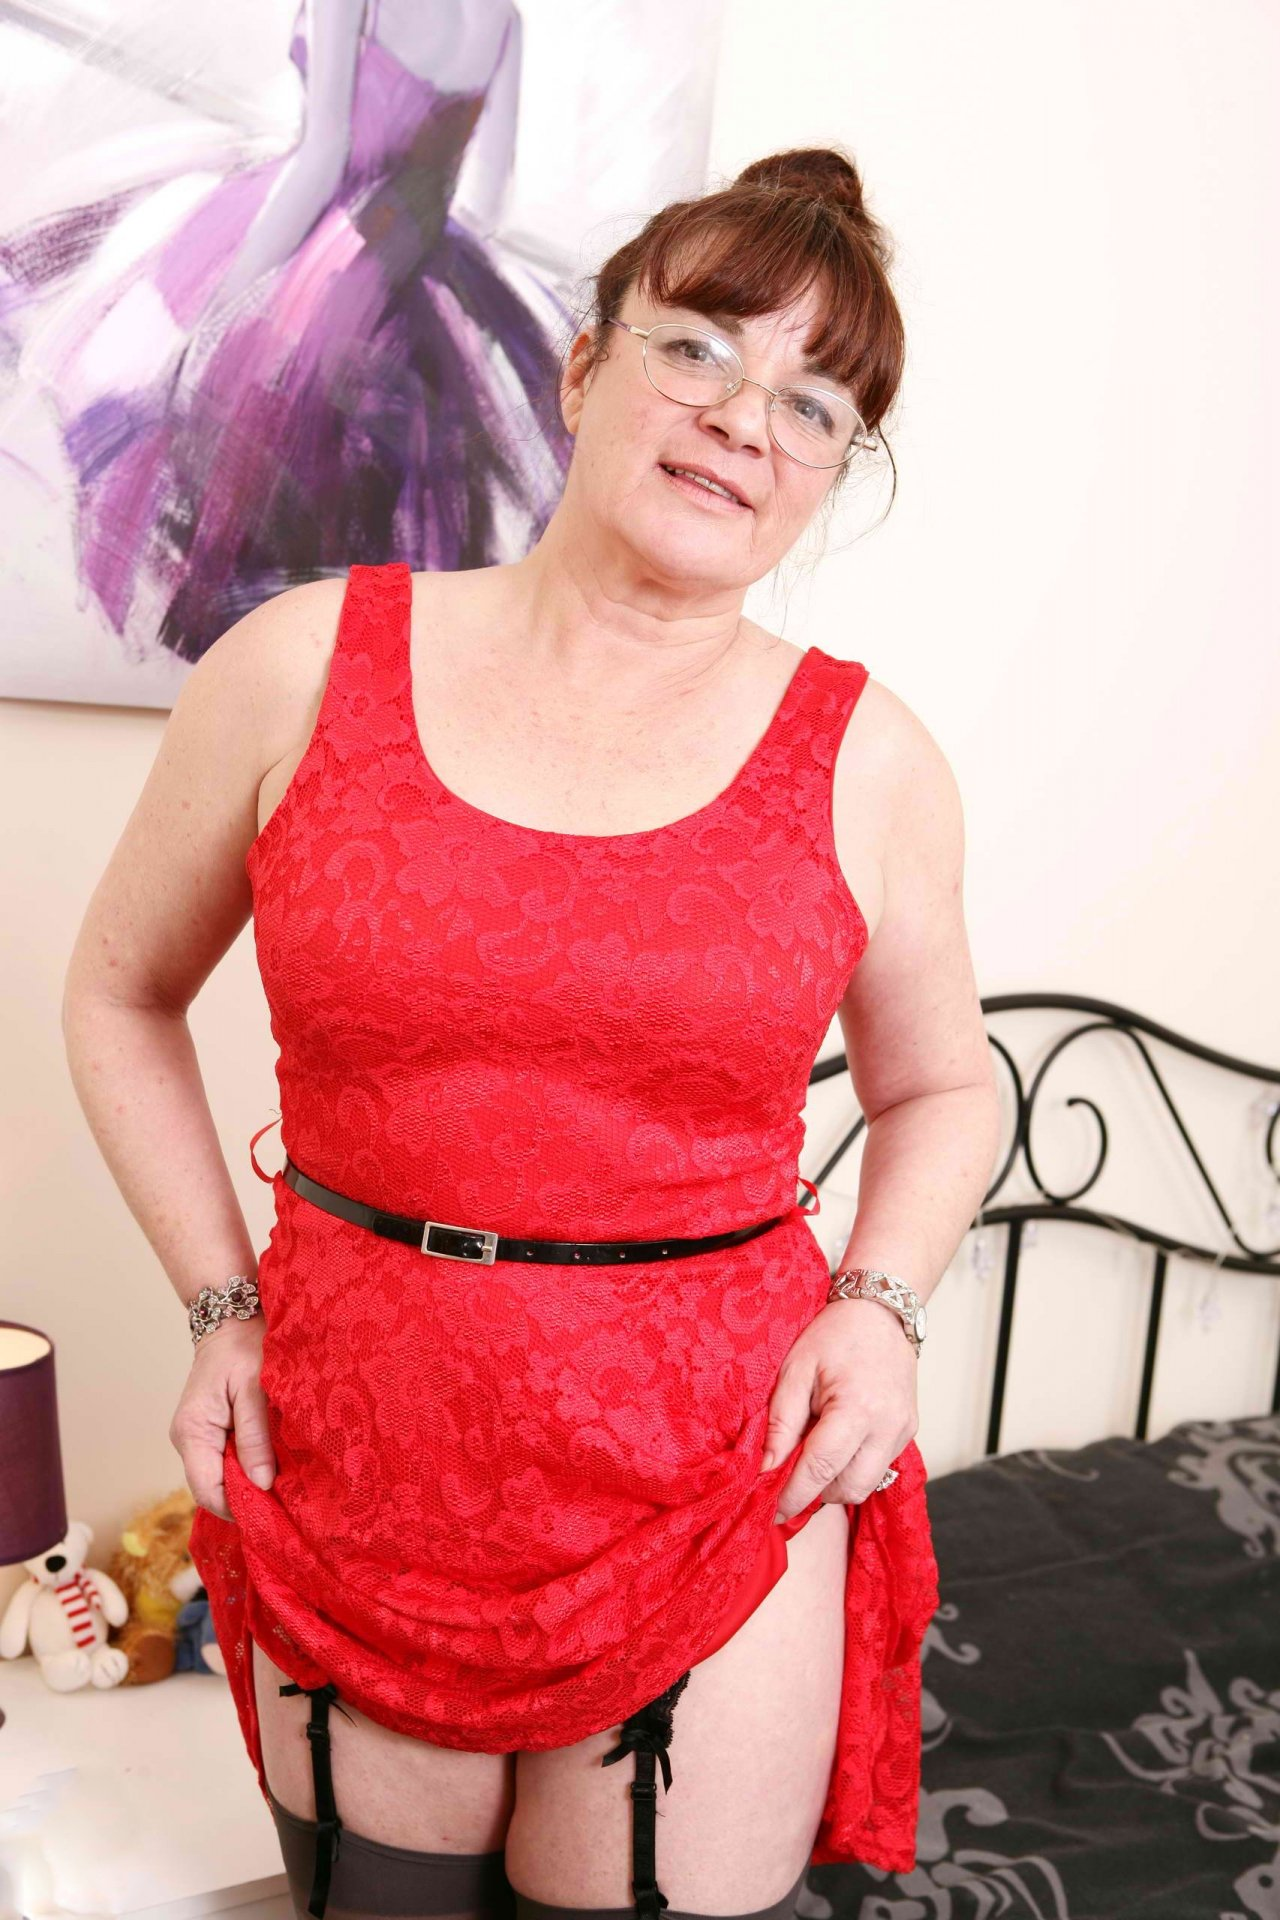 MissAvaLane from North Lanarkshire,United Kingdom